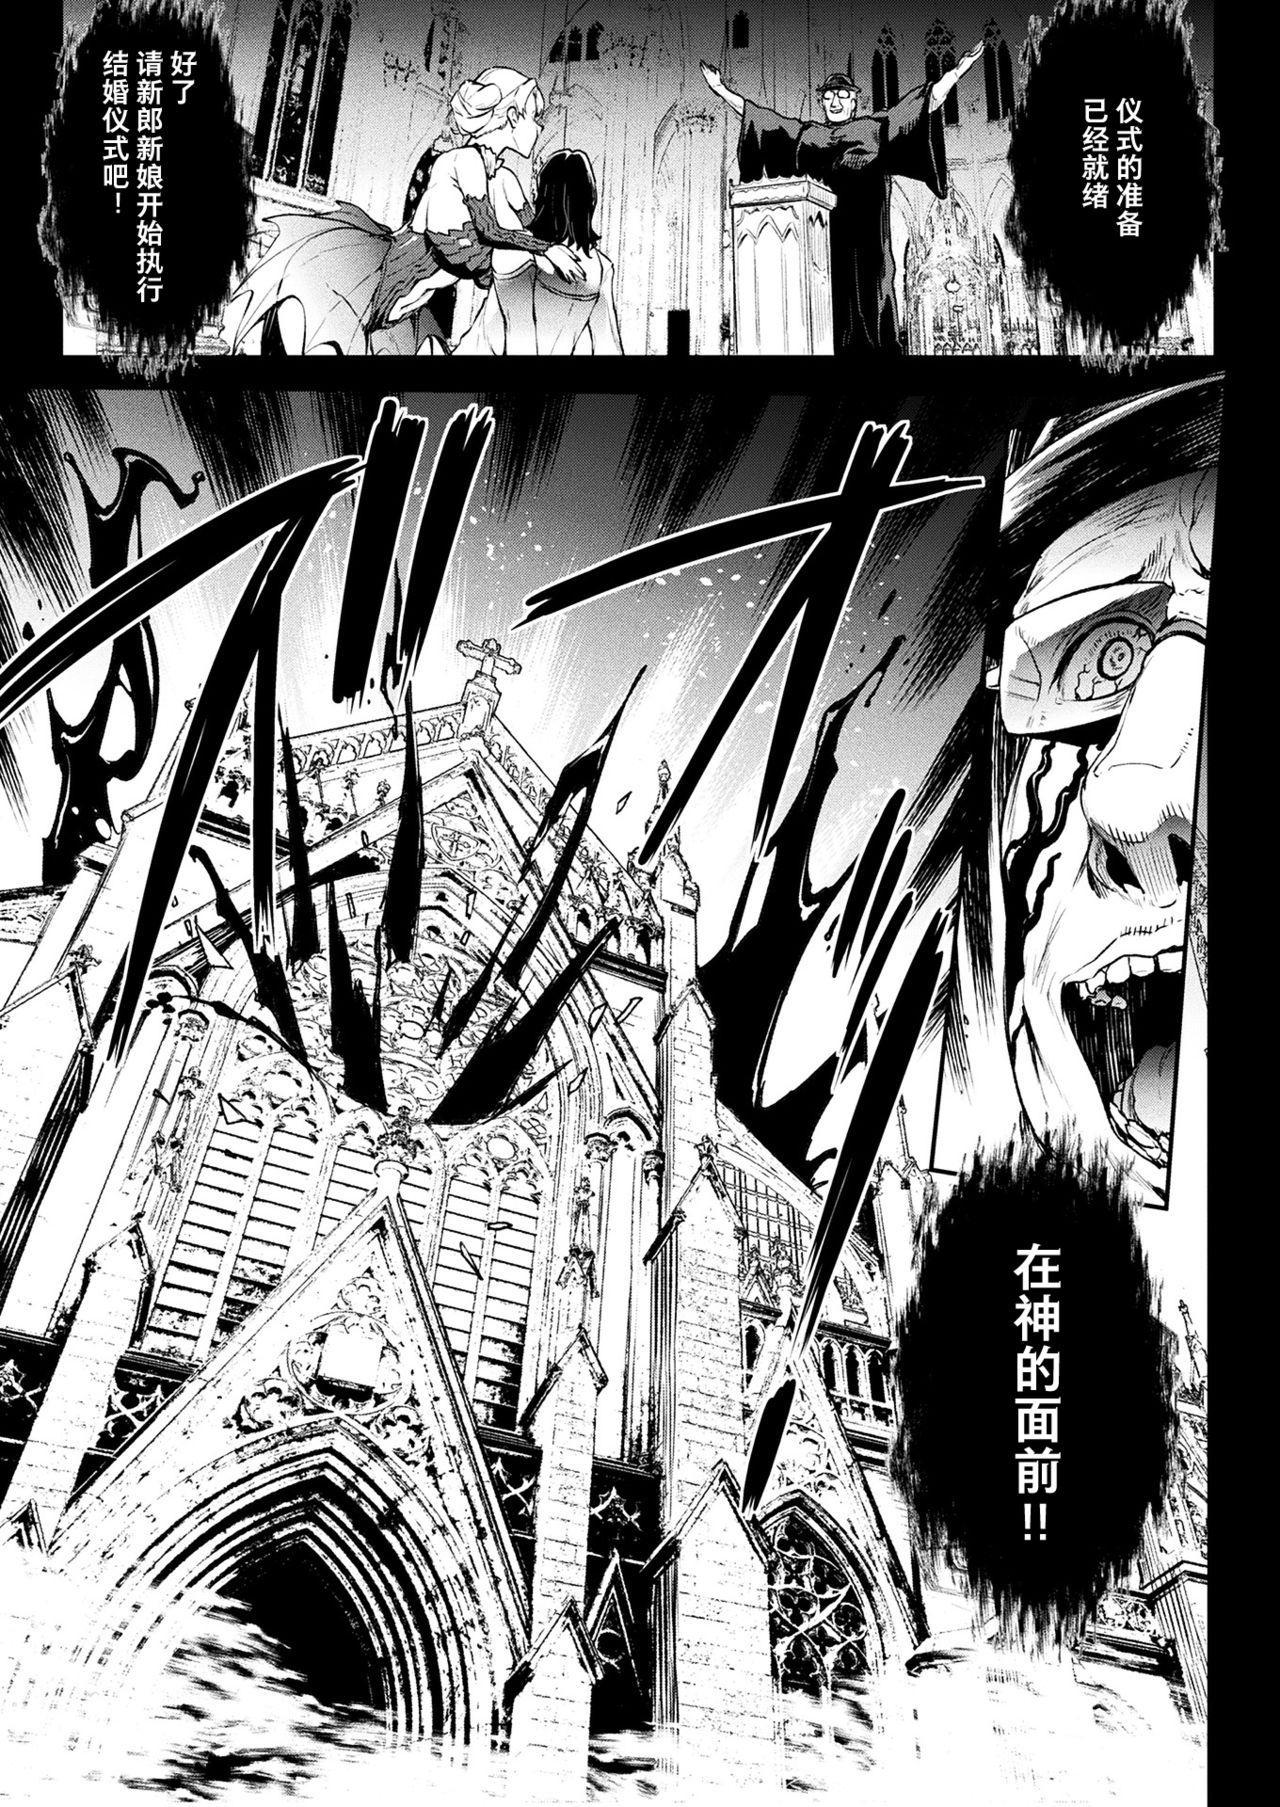 [Erect Sawaru] Raikou Shinki Igis Magia -PANDRA saga 3rd ignition- Ch. 24 (COMIC Unreal 2020-08 Vol. 86) [Chinese] [不咕鸟汉化组] [Digital] 4